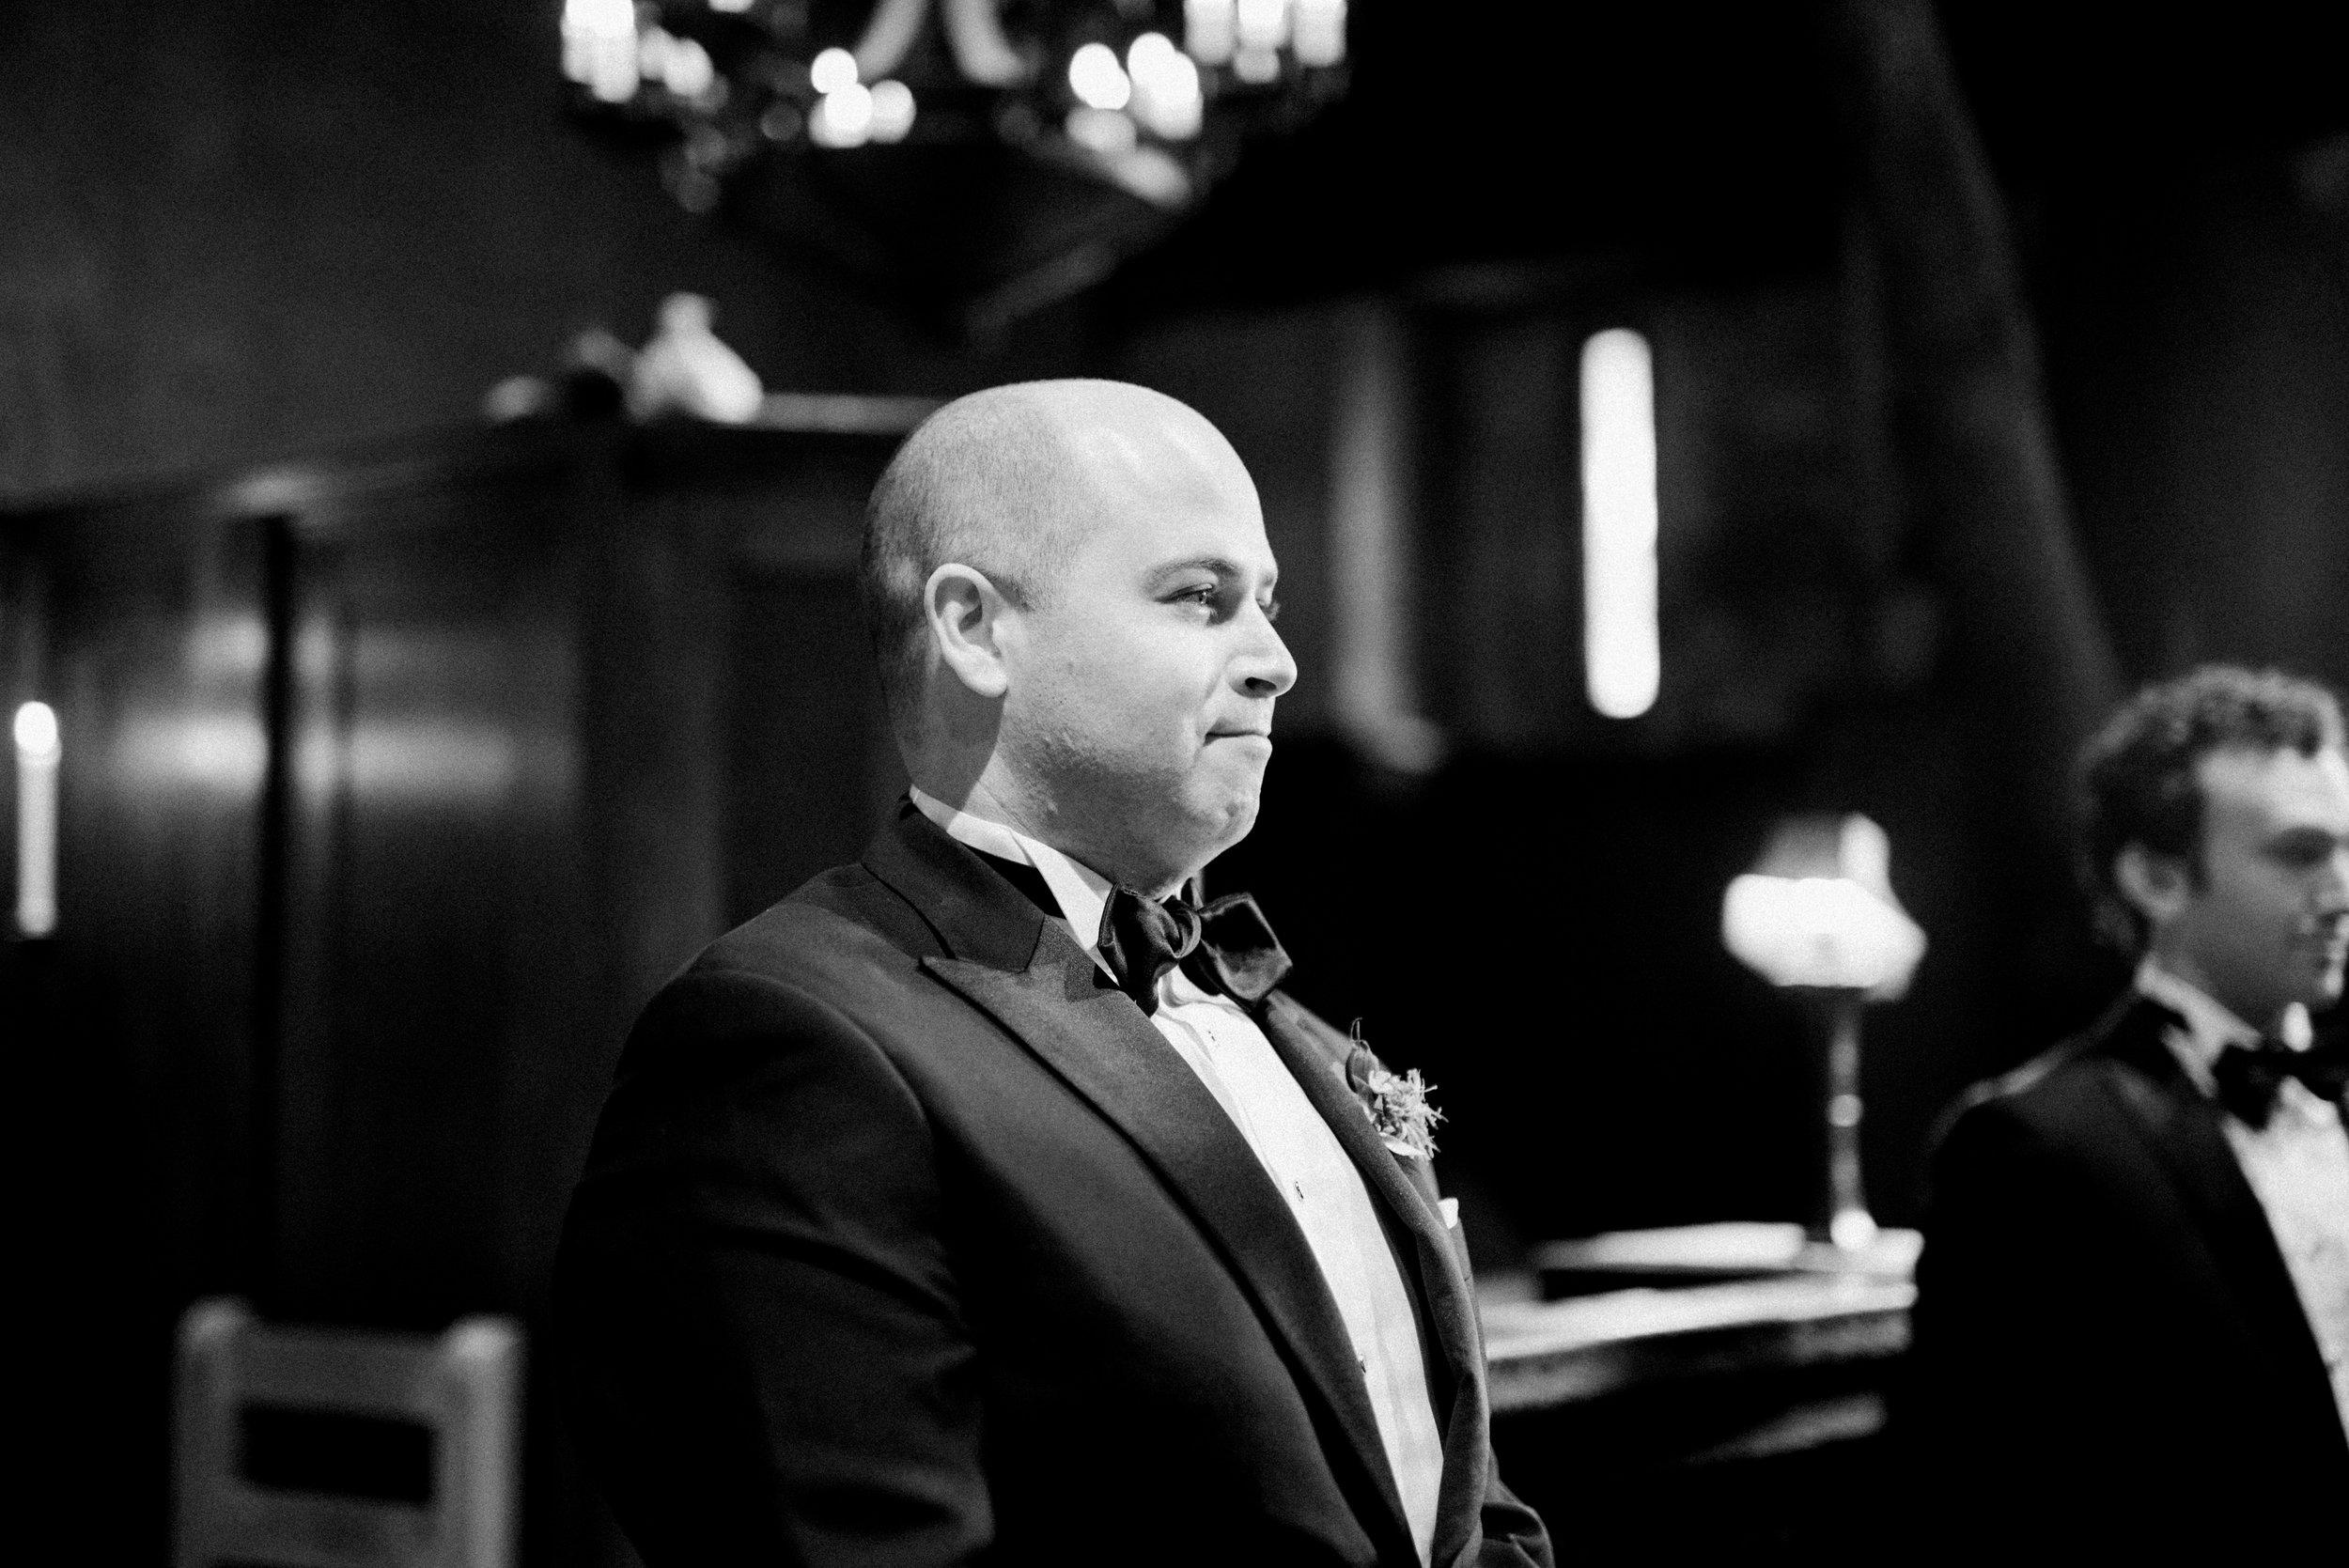 Swedenborgian Church Dogpatch Winery Wedding023.jpg